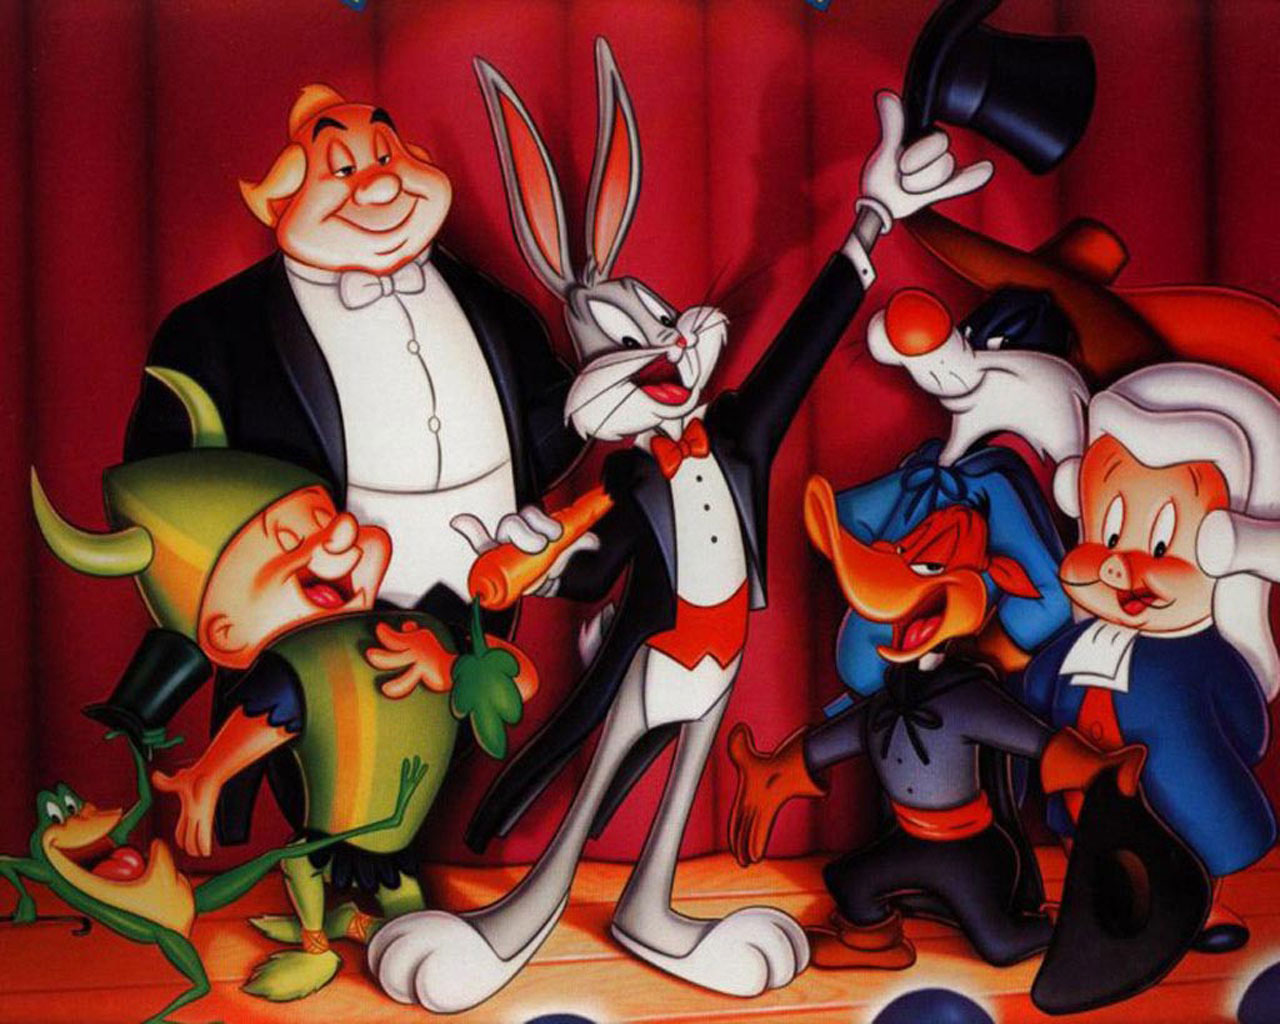 http://4.bp.blogspot.com/-H4149JM_Ips/ToQJ106ST9I/AAAAAAAAAhI/U0vEDSUUUmo/s1600/bugs-bunny-wallpaper-12-719502.jpg